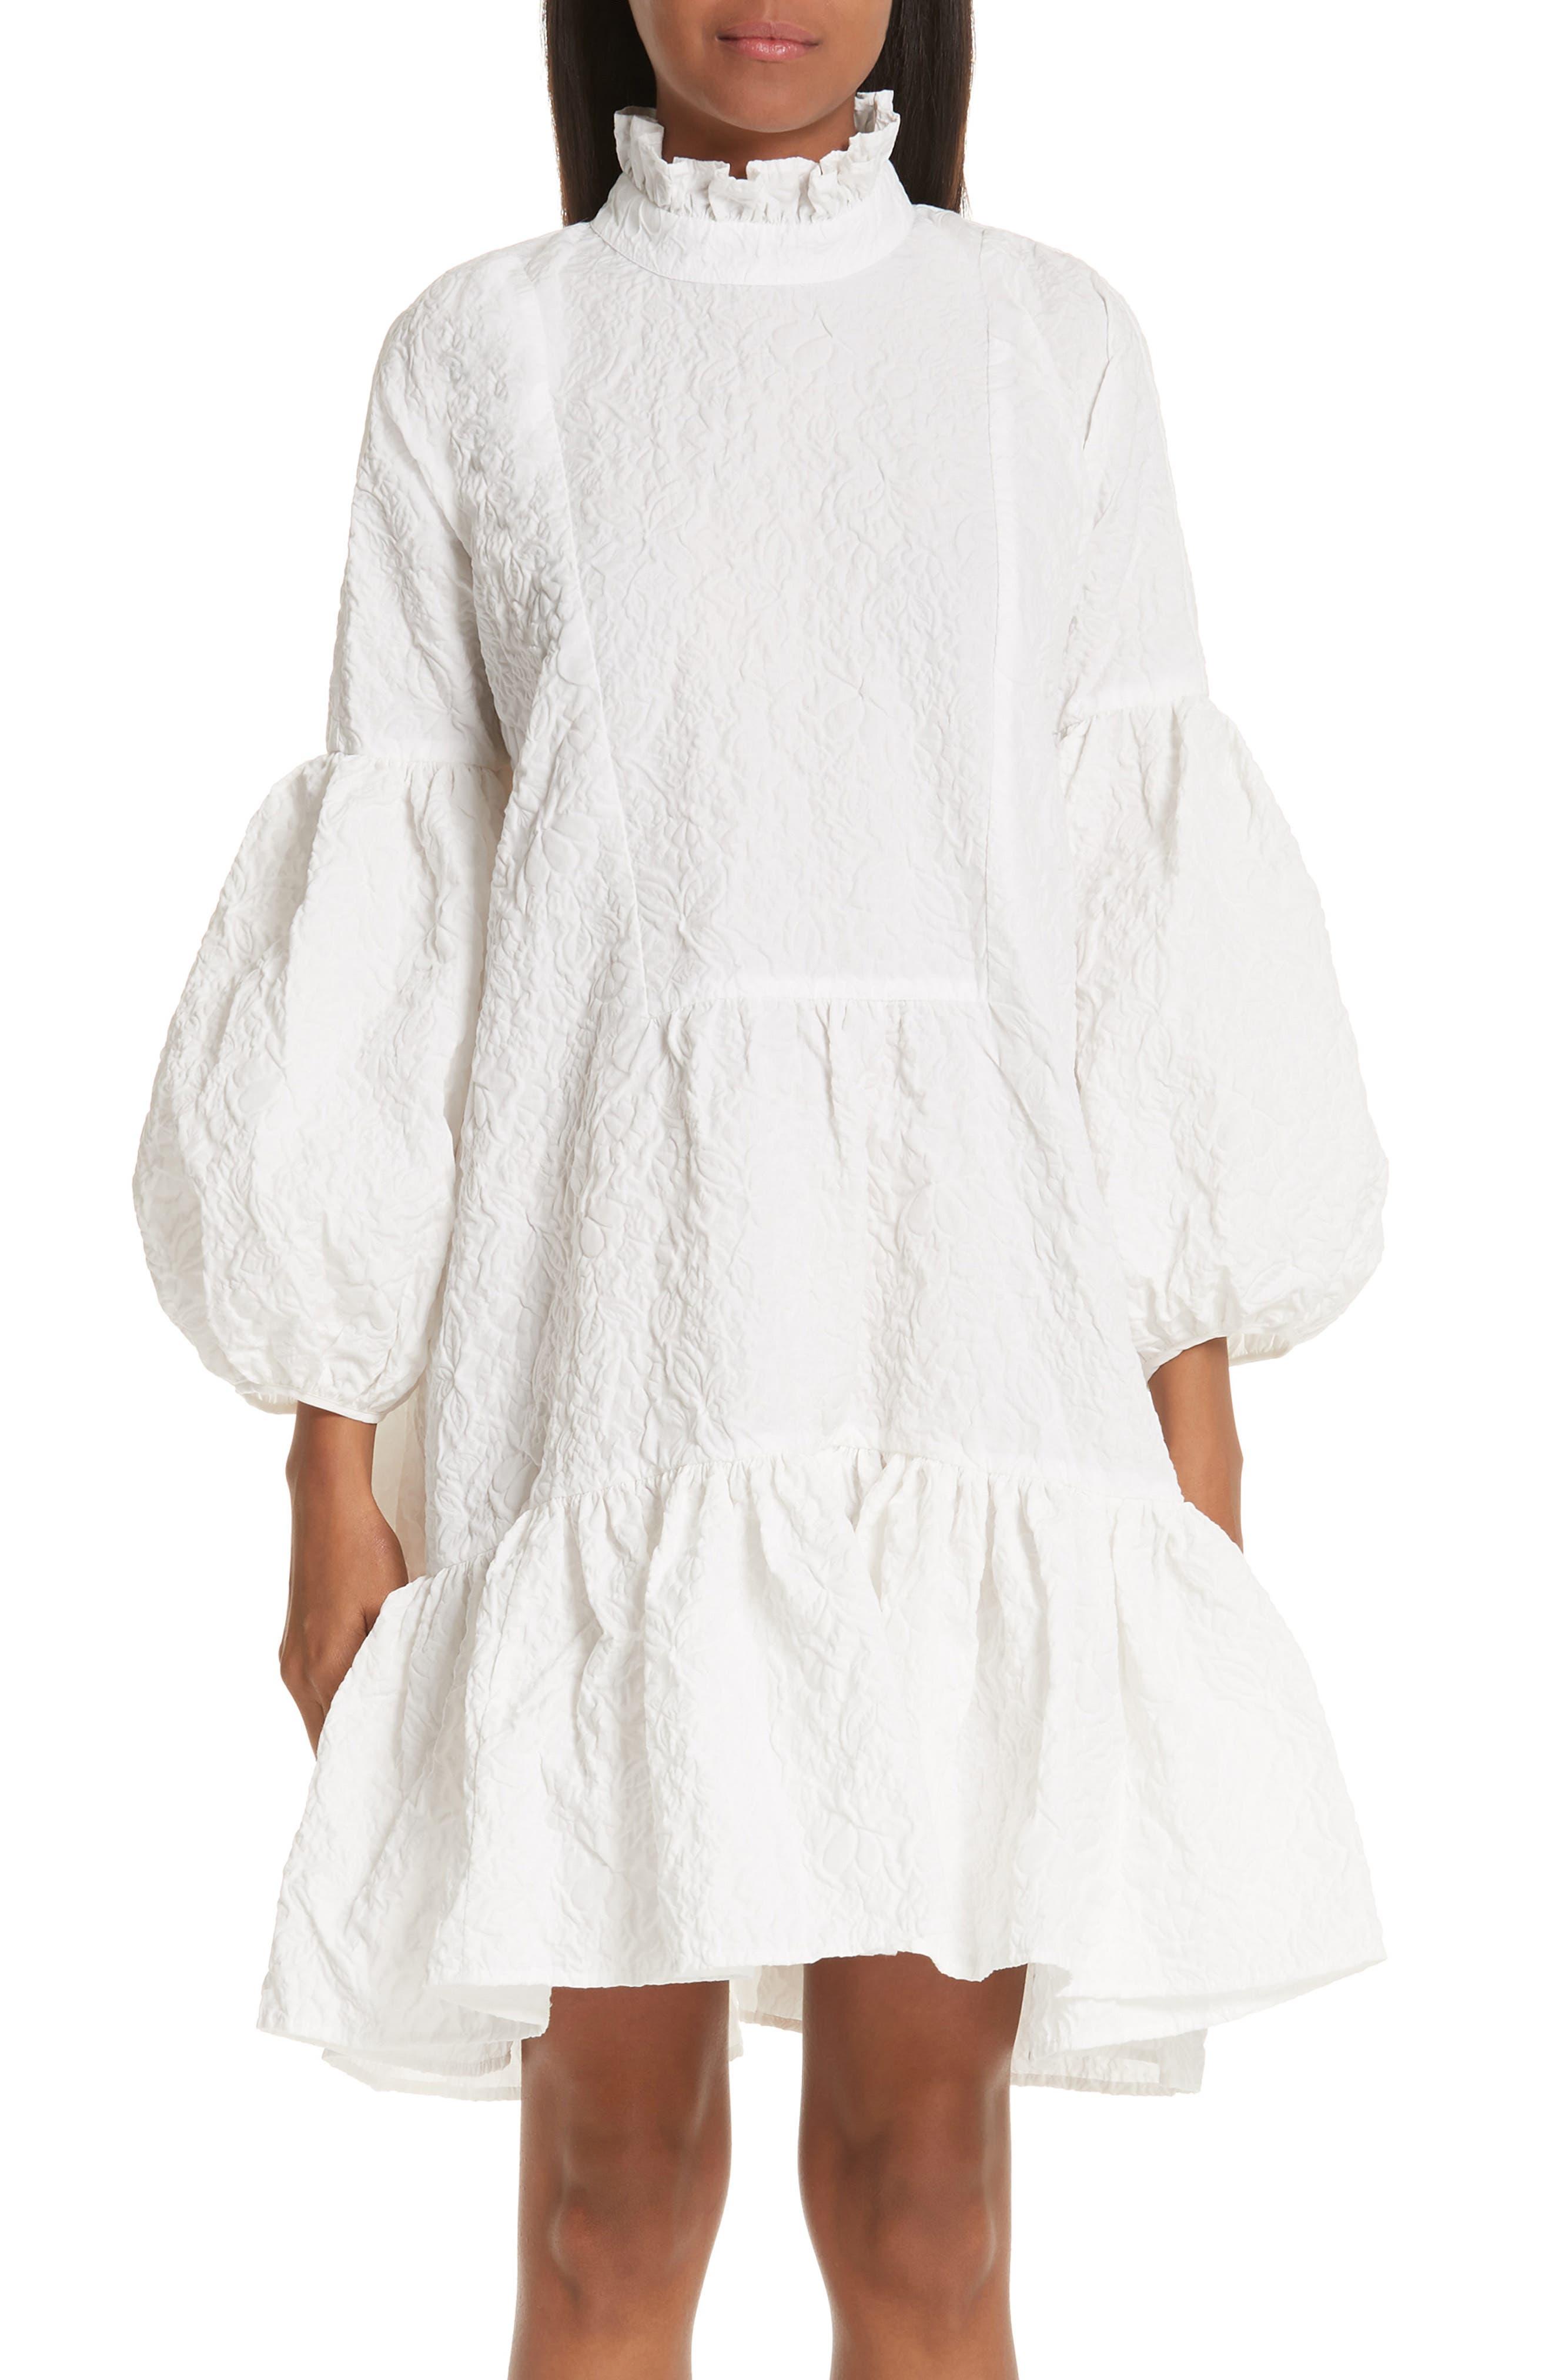 CECILIE BAHNSEN Belle Dress in White